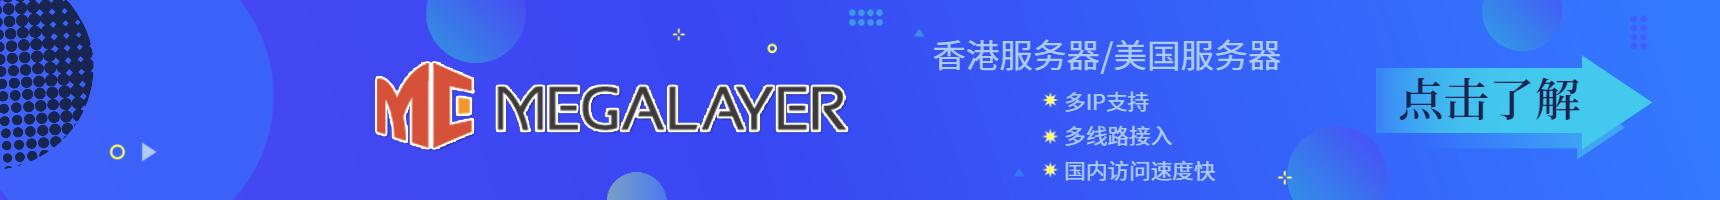 Megalayer美国服务器